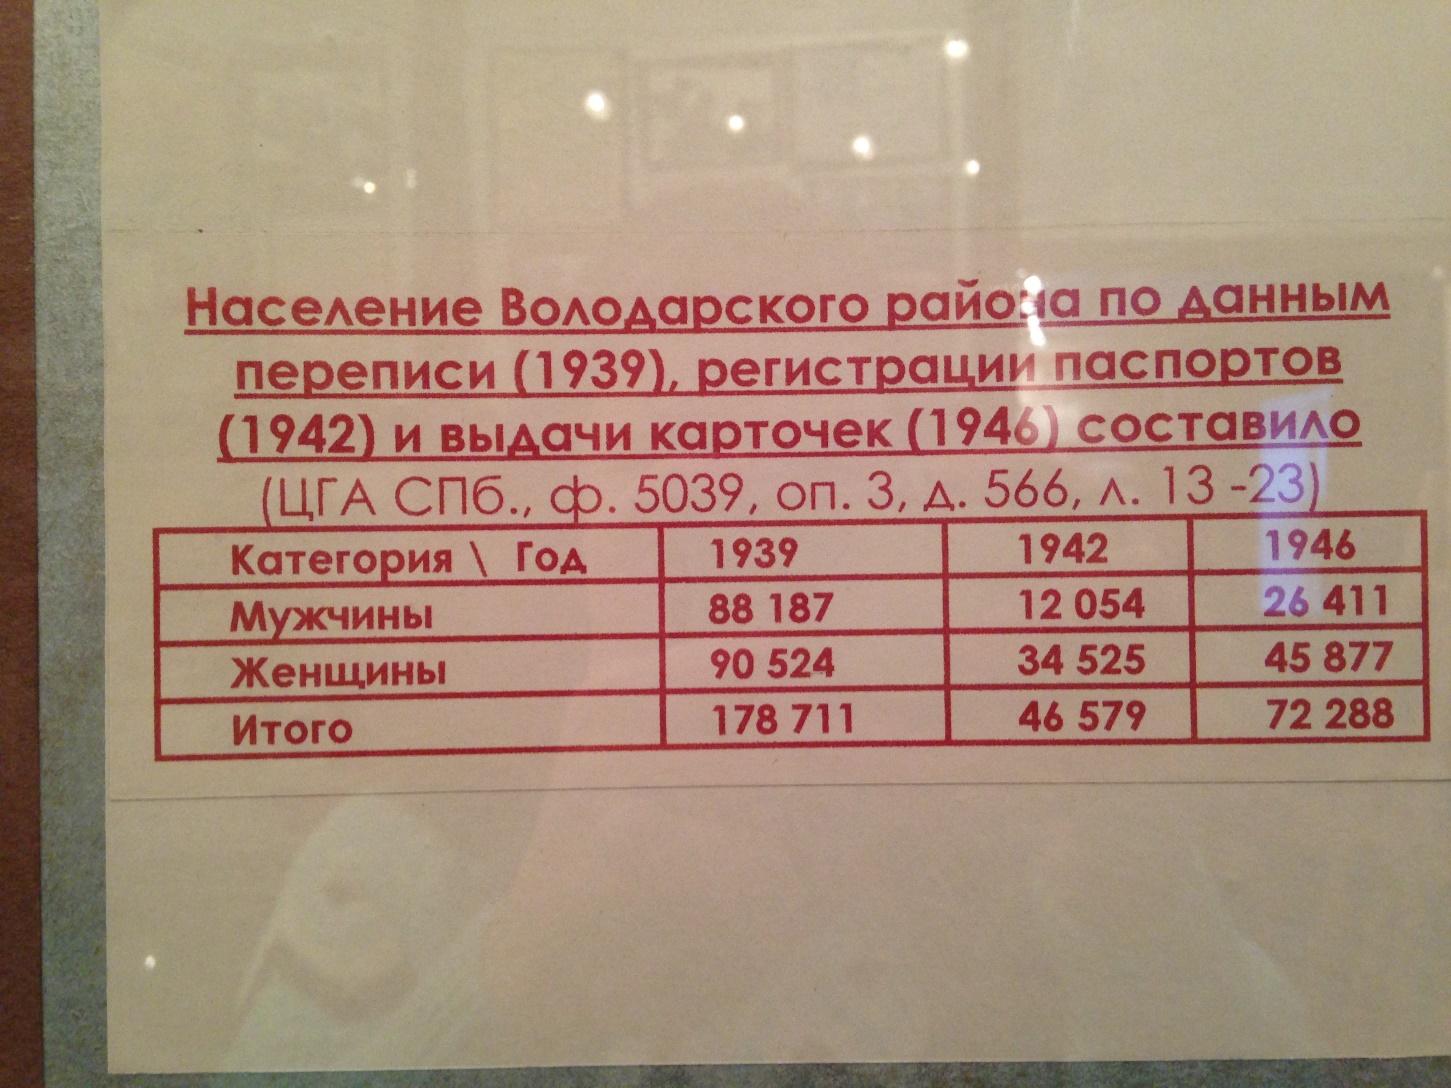 G:\Фото из музея\IMG_7516.JPG